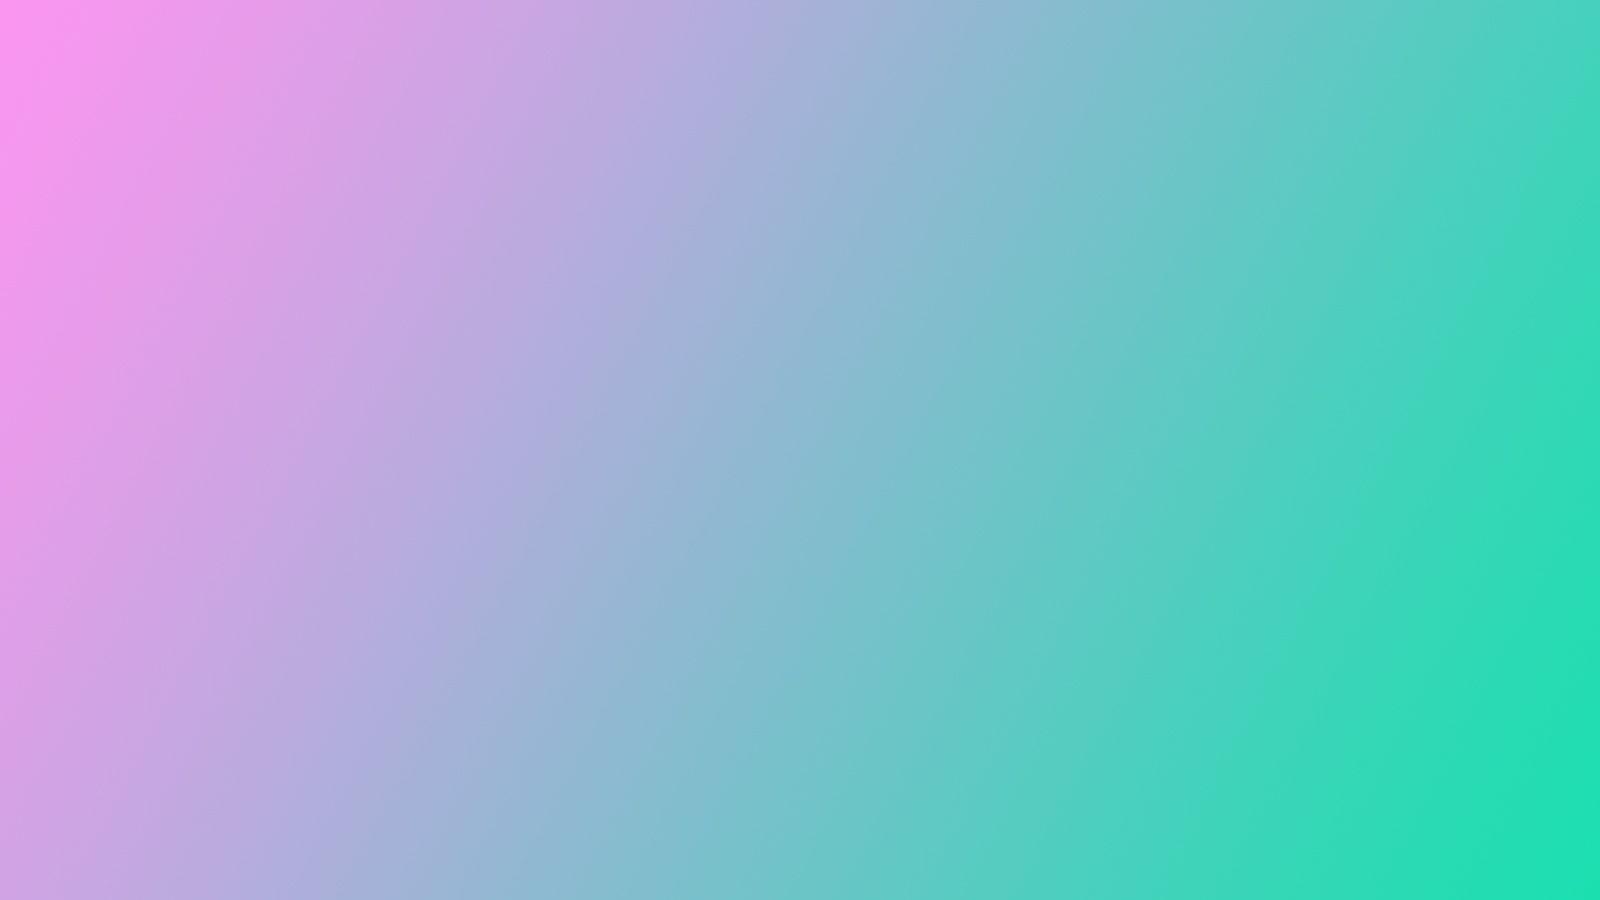 Pastel Backgrounds Image - Wallpaper Cave